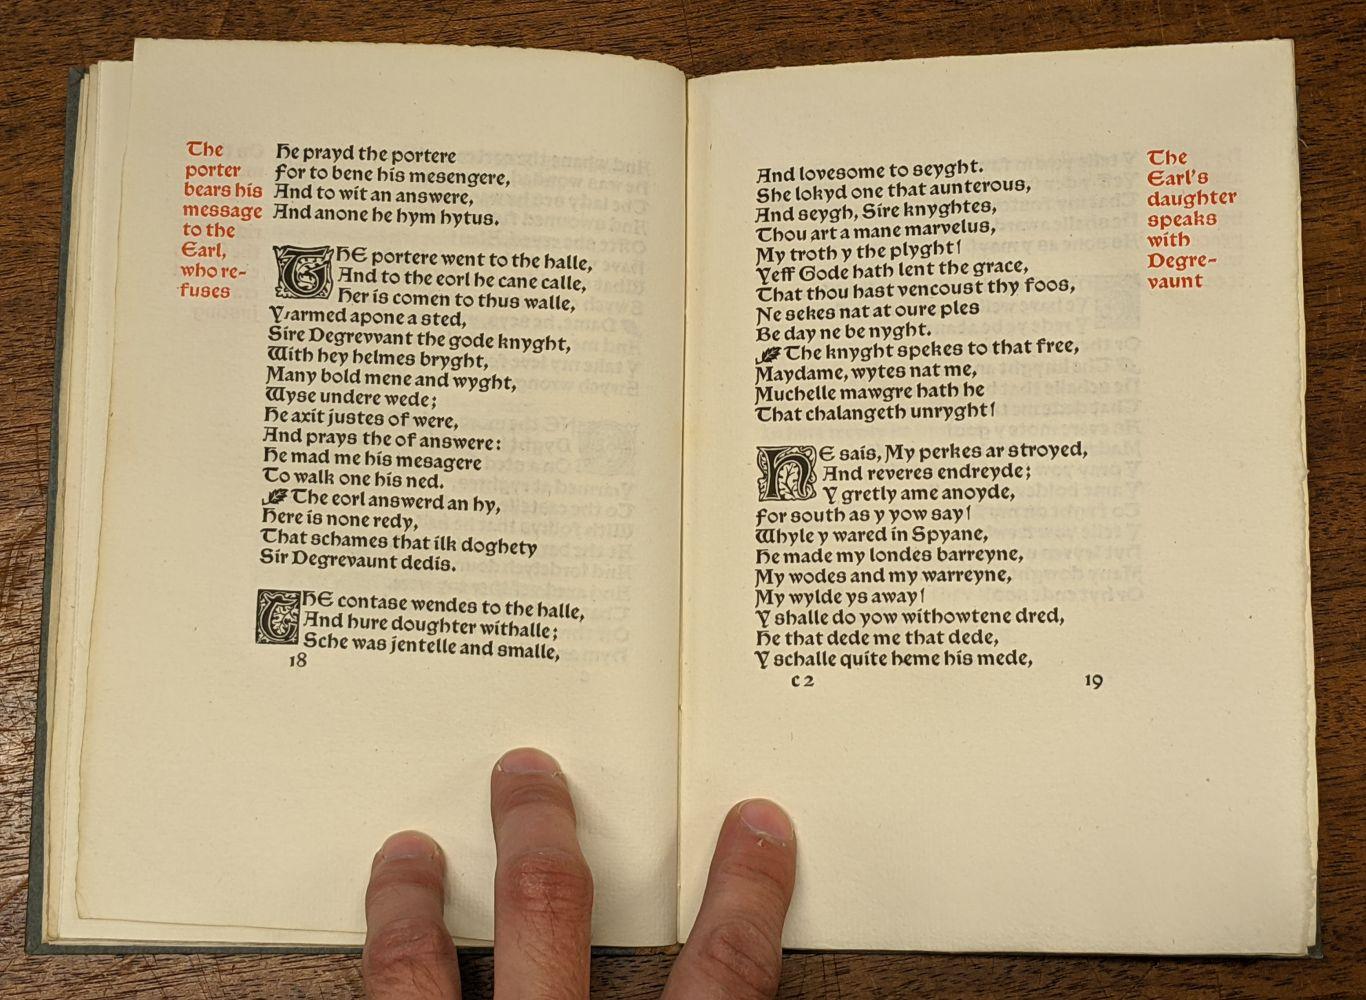 Kelmscott Press. The Romance of Sir Degrevant, 1896 - Image 6 of 8